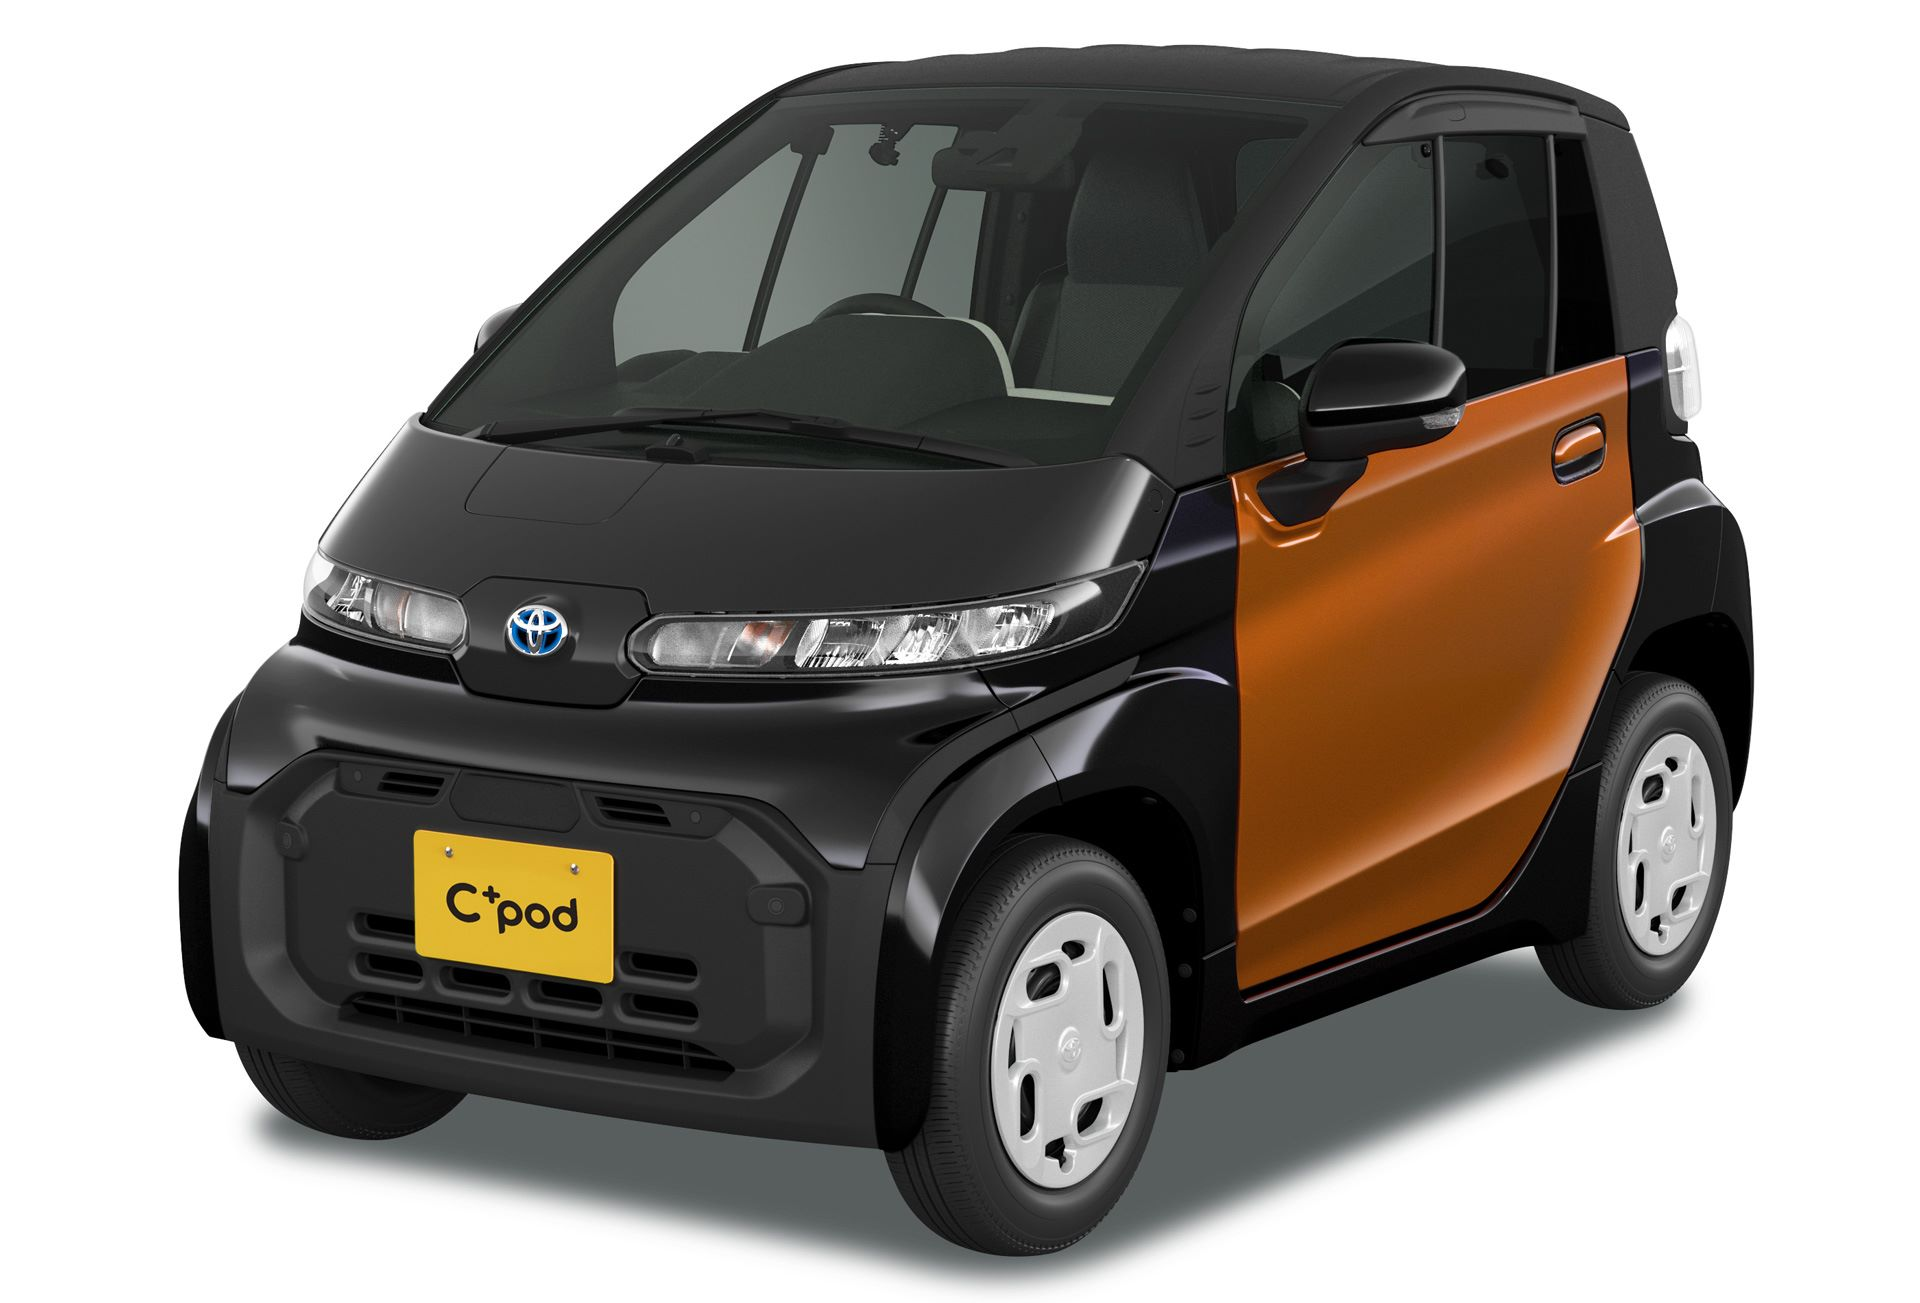 Toyota-C-pod-18